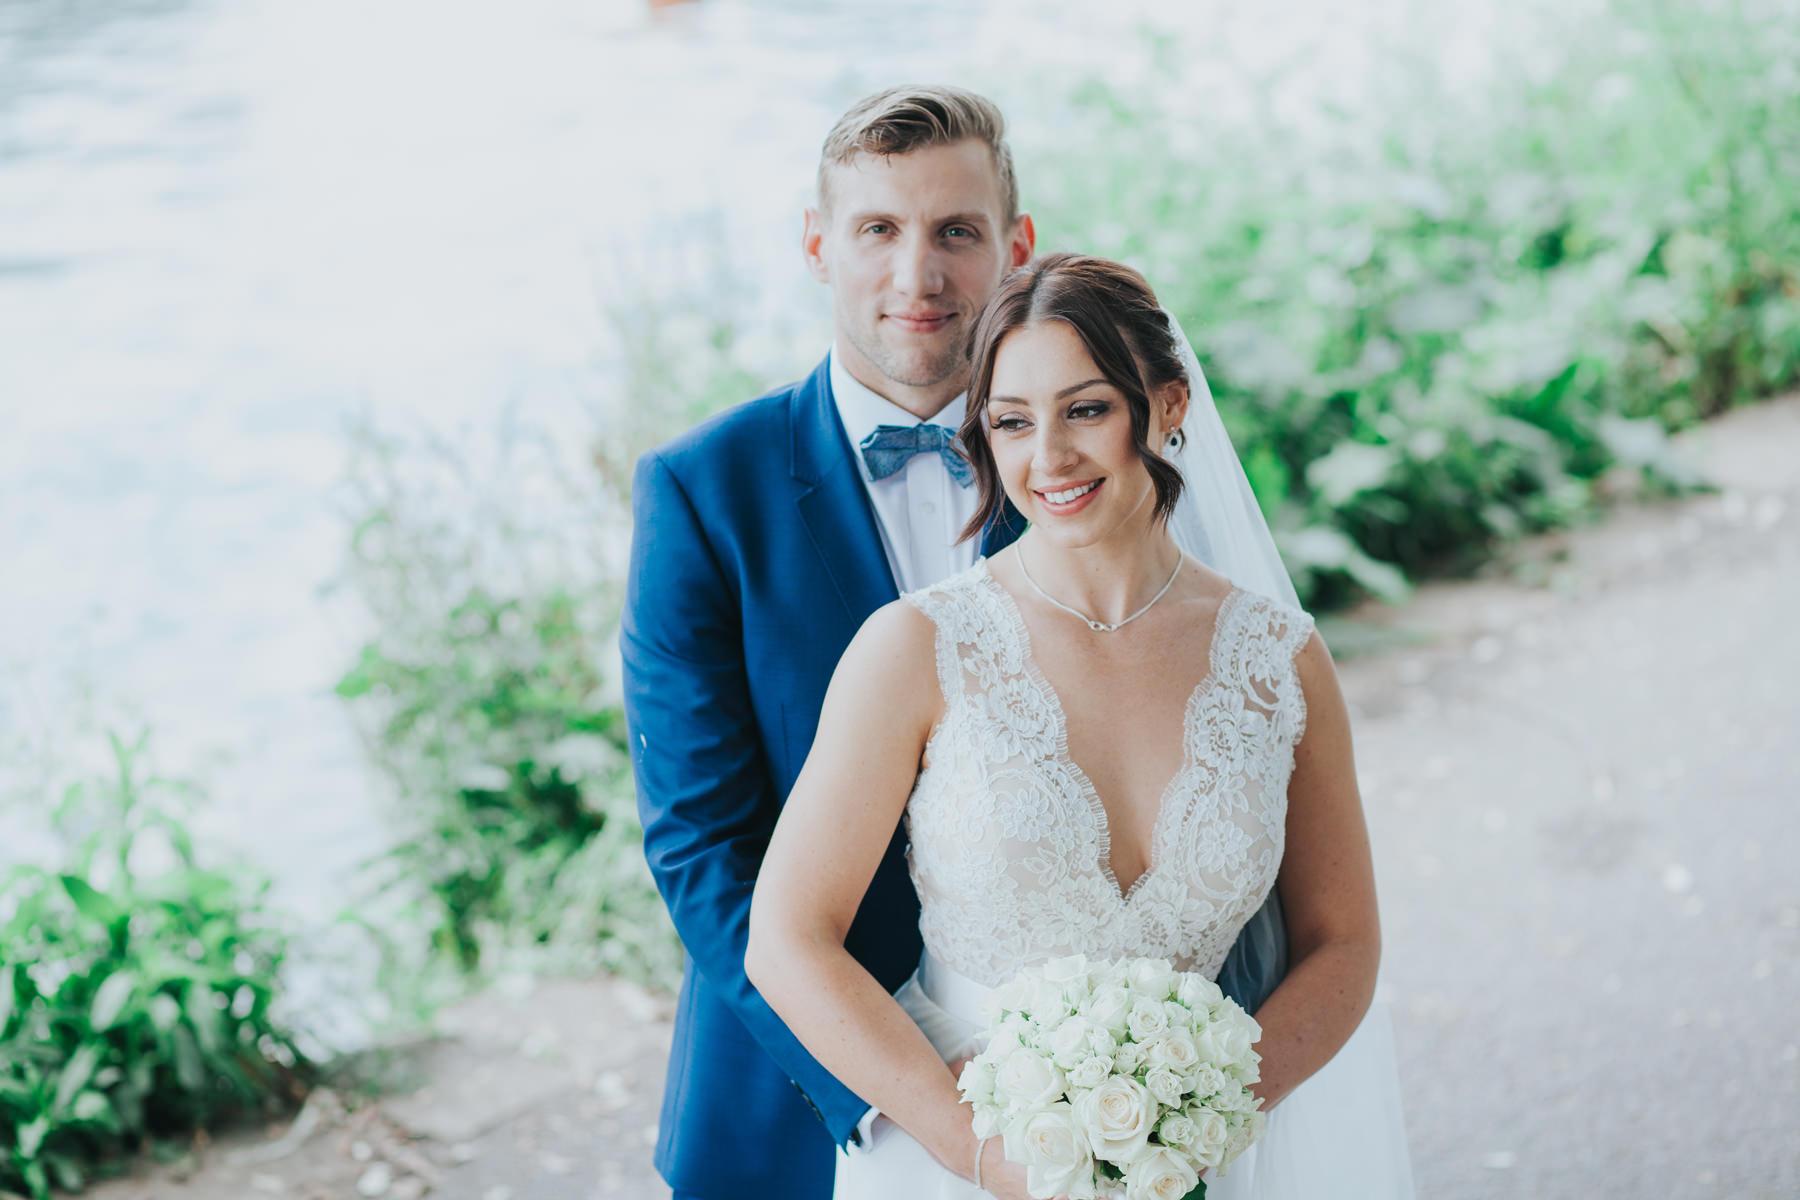 CRL-416-The Bingham wedding Richmond-Claire Rob bridal couple portraits on Thamespath.jpg